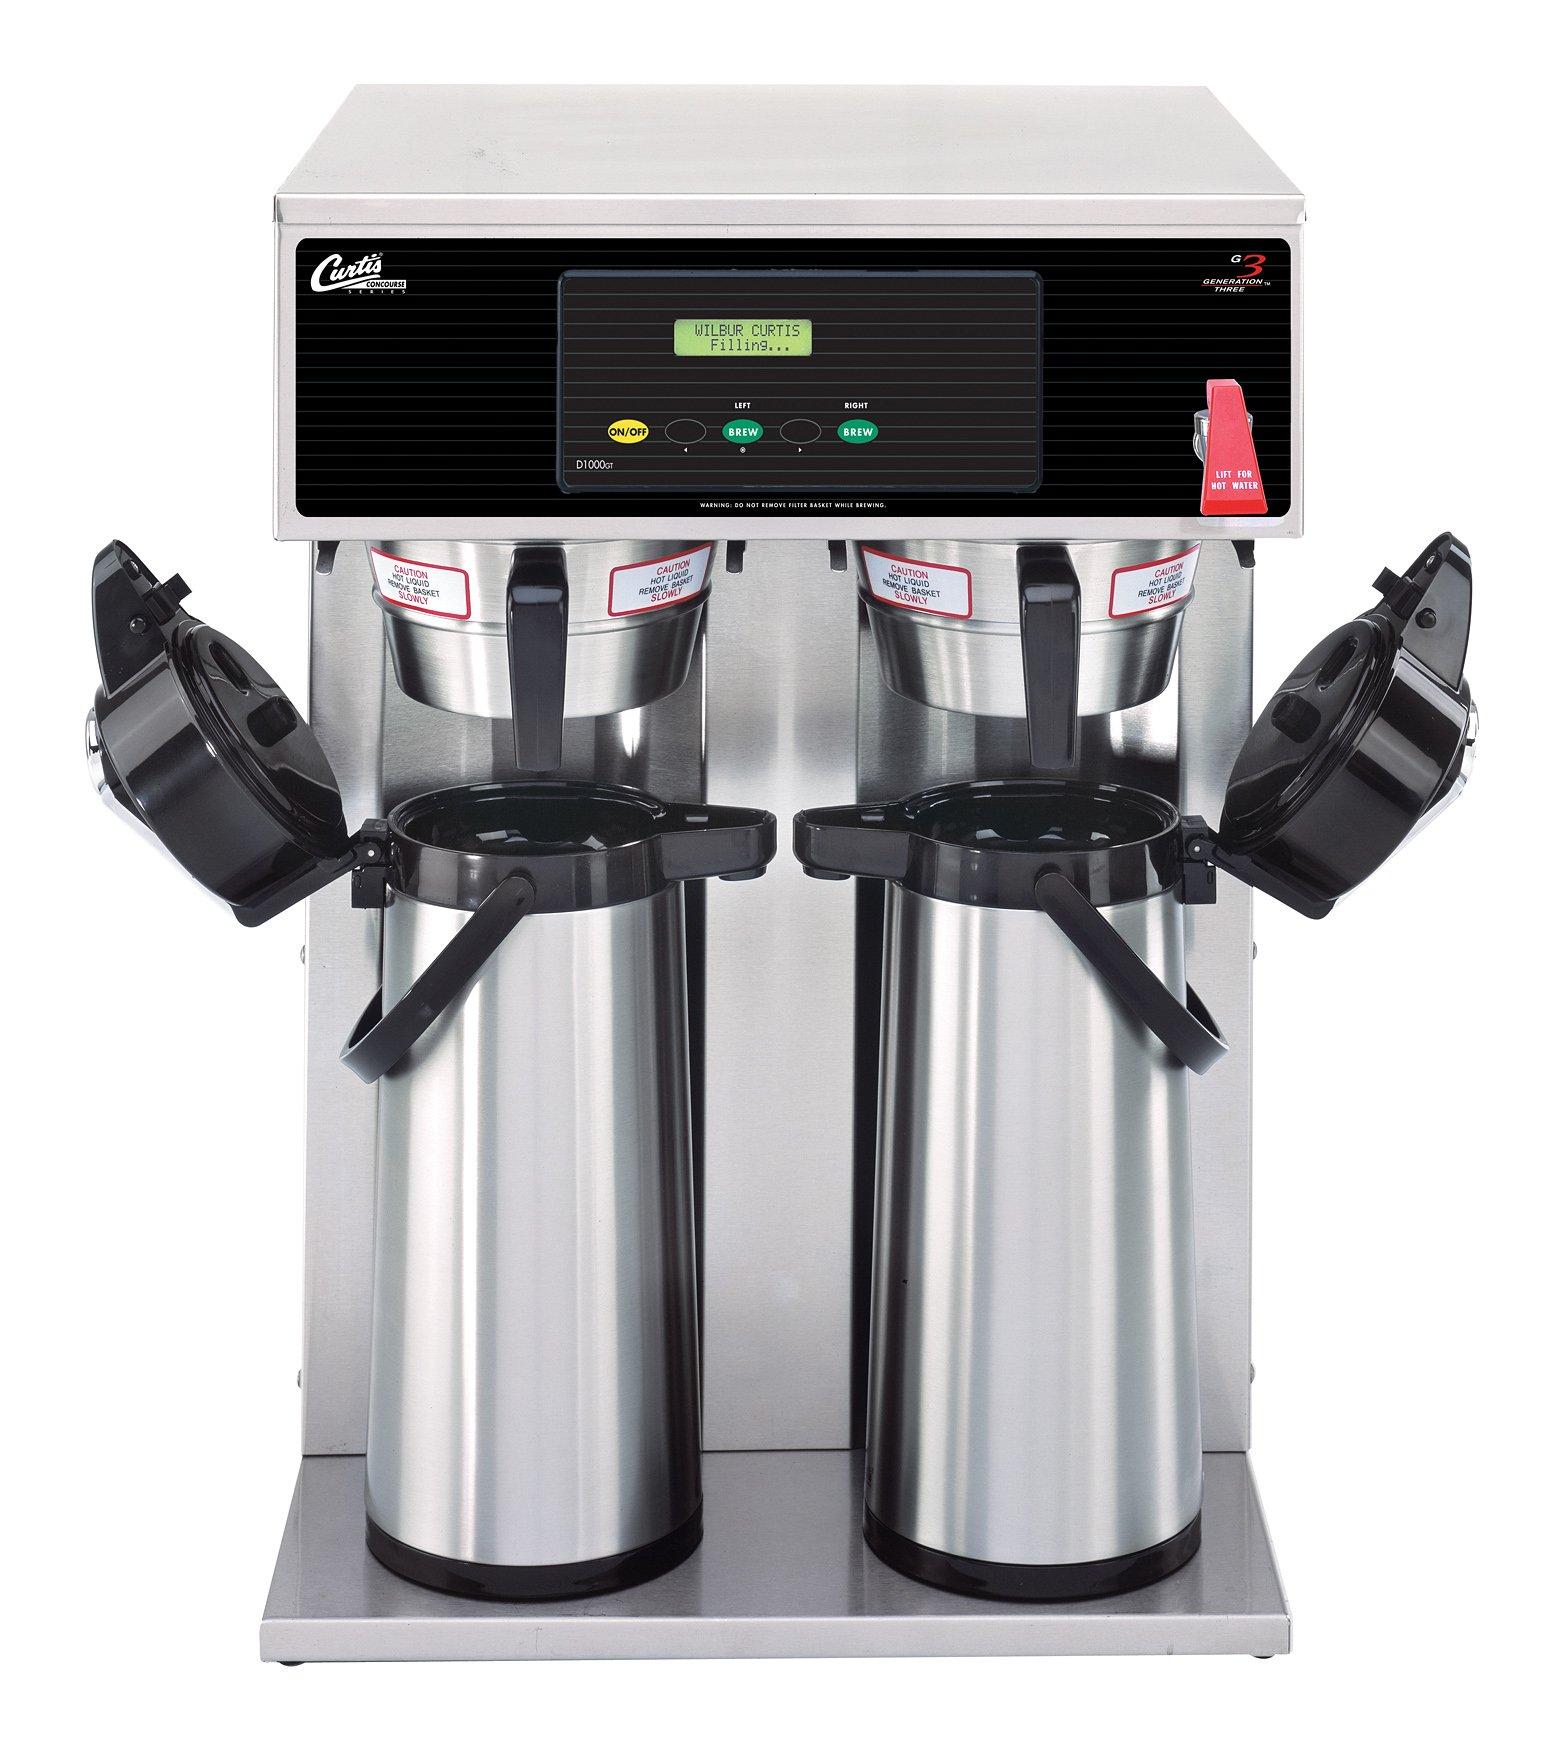 Wilbur Curtis G3 Airpot Brewer 2.2L To 2.5L Twin/Standard Airpot Coffee Brewer Dual Voltage - Commercial Airpot Coffee Brewer  - D1000GT63A000 (Each)